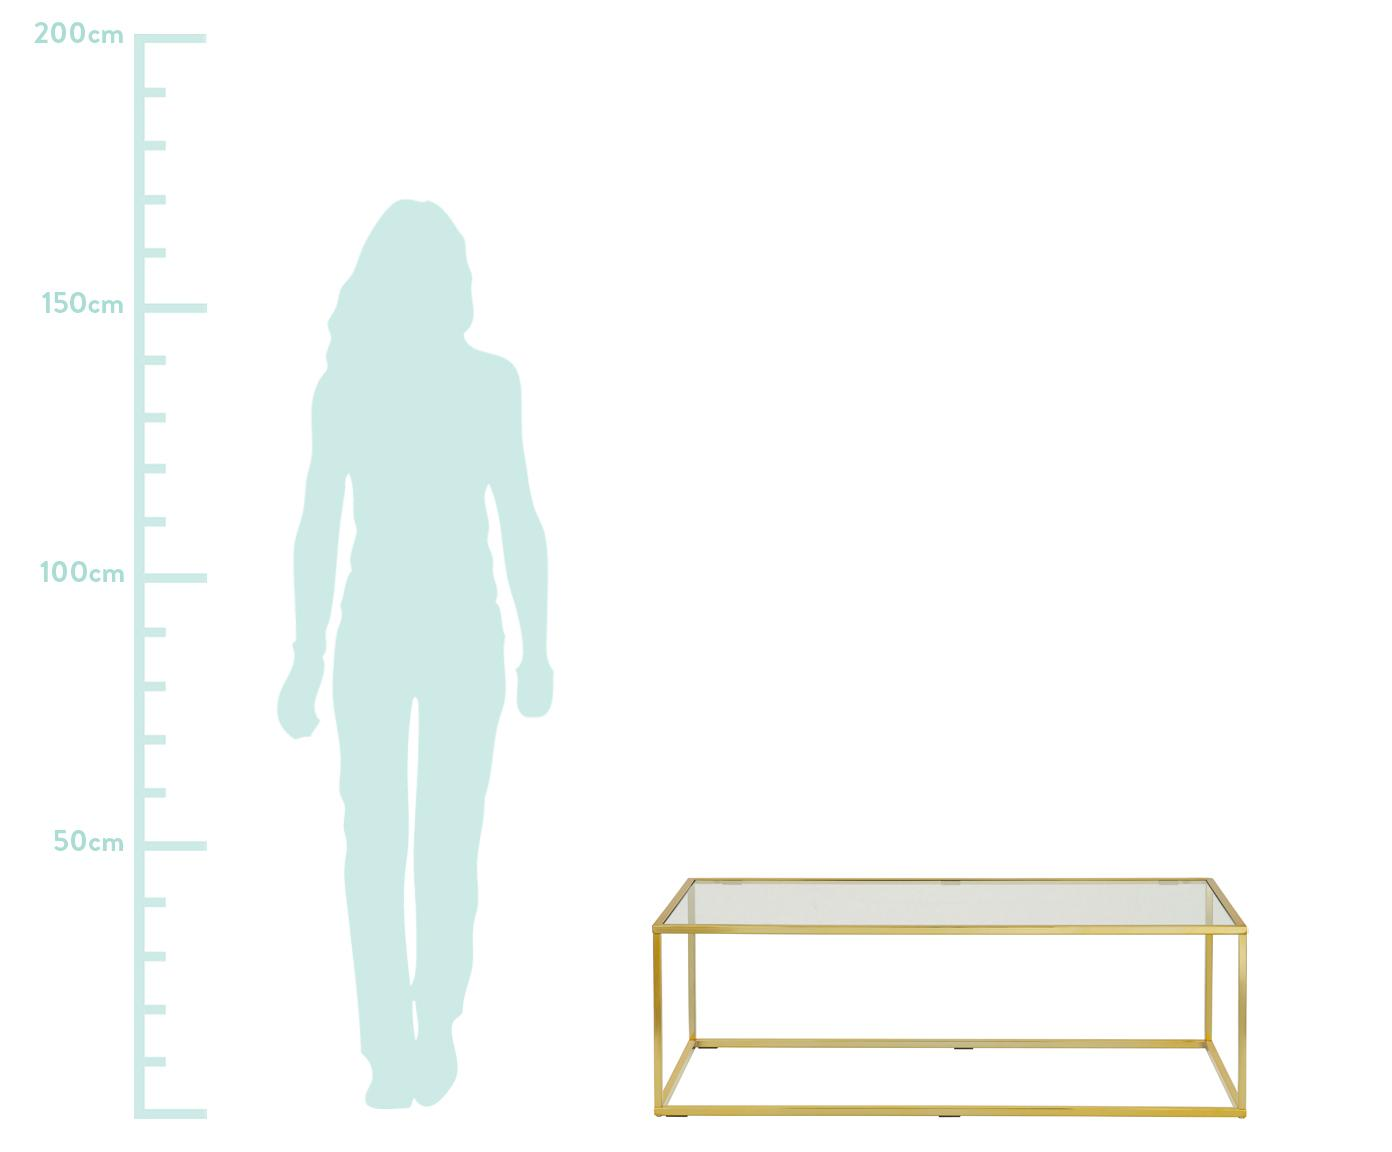 Salontafel Maya met glazen tafelblad, Tafelblad: veiligheidsglas, Frame: gegalvaniseerd metaal, Tafelblad: glas, transparant. Frame: glanzend goudkleurig, B 110 x D 50 cm